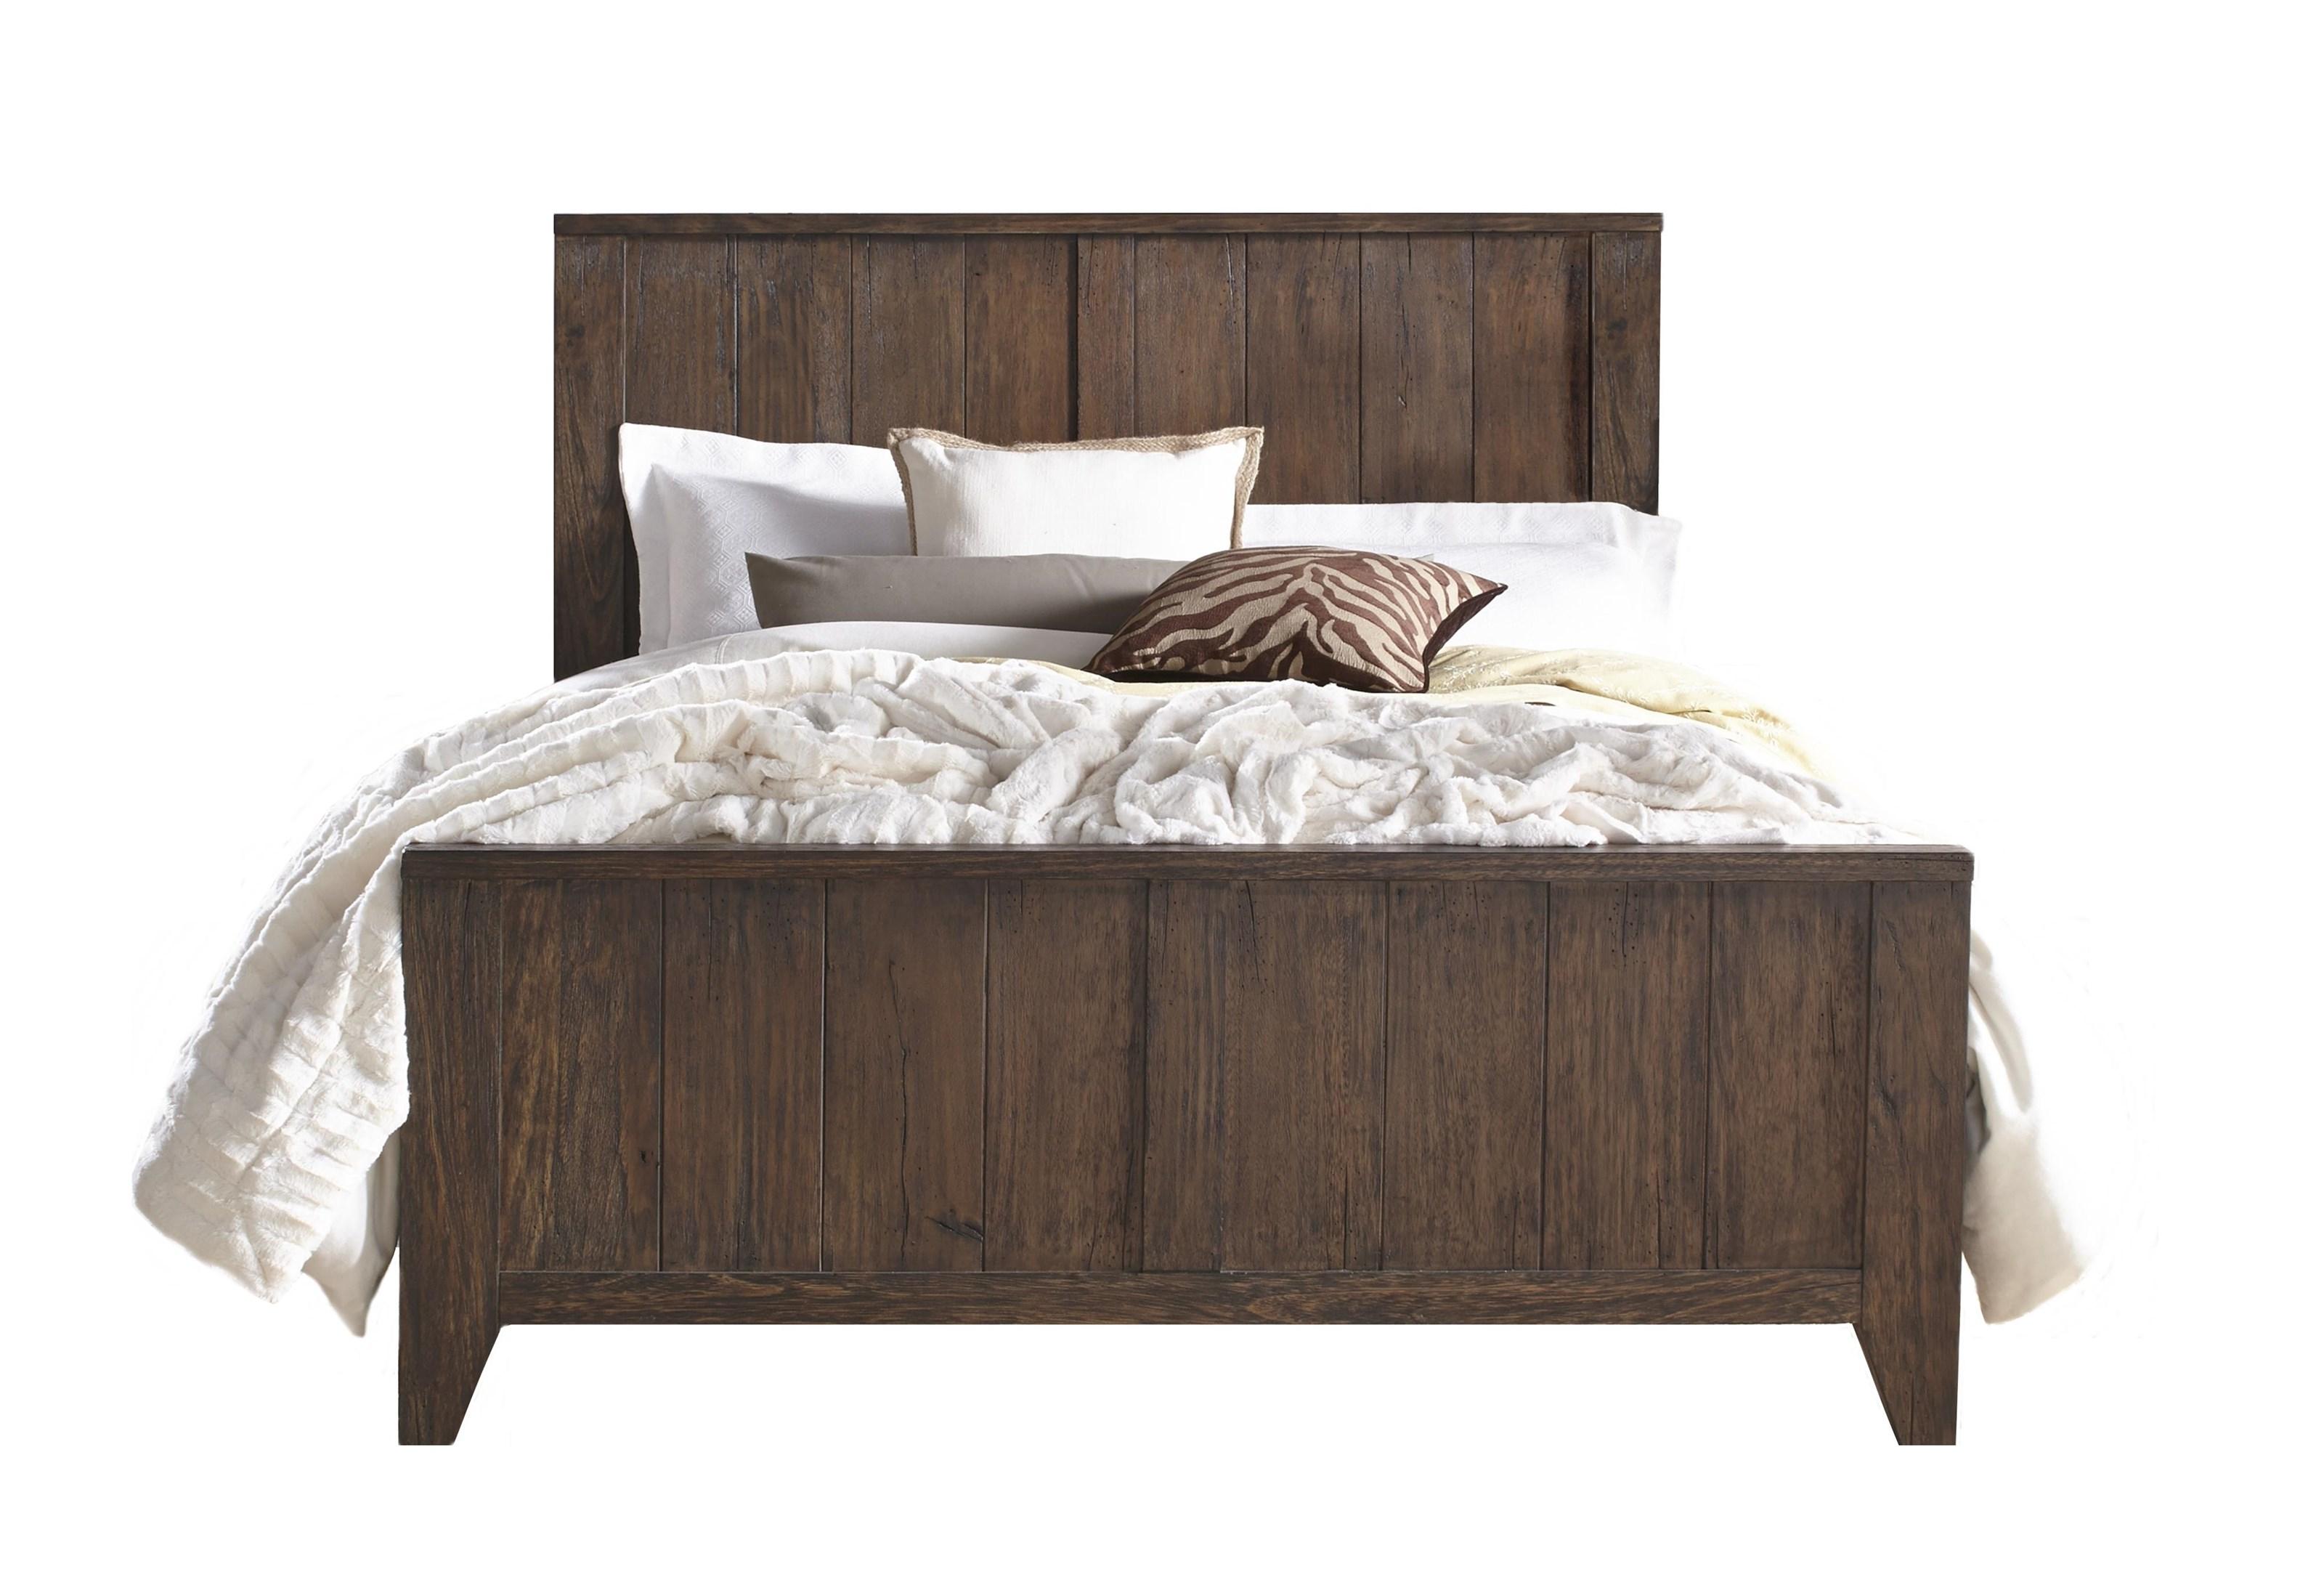 Corinth King Bed by Modus International at HomeWorld Furniture